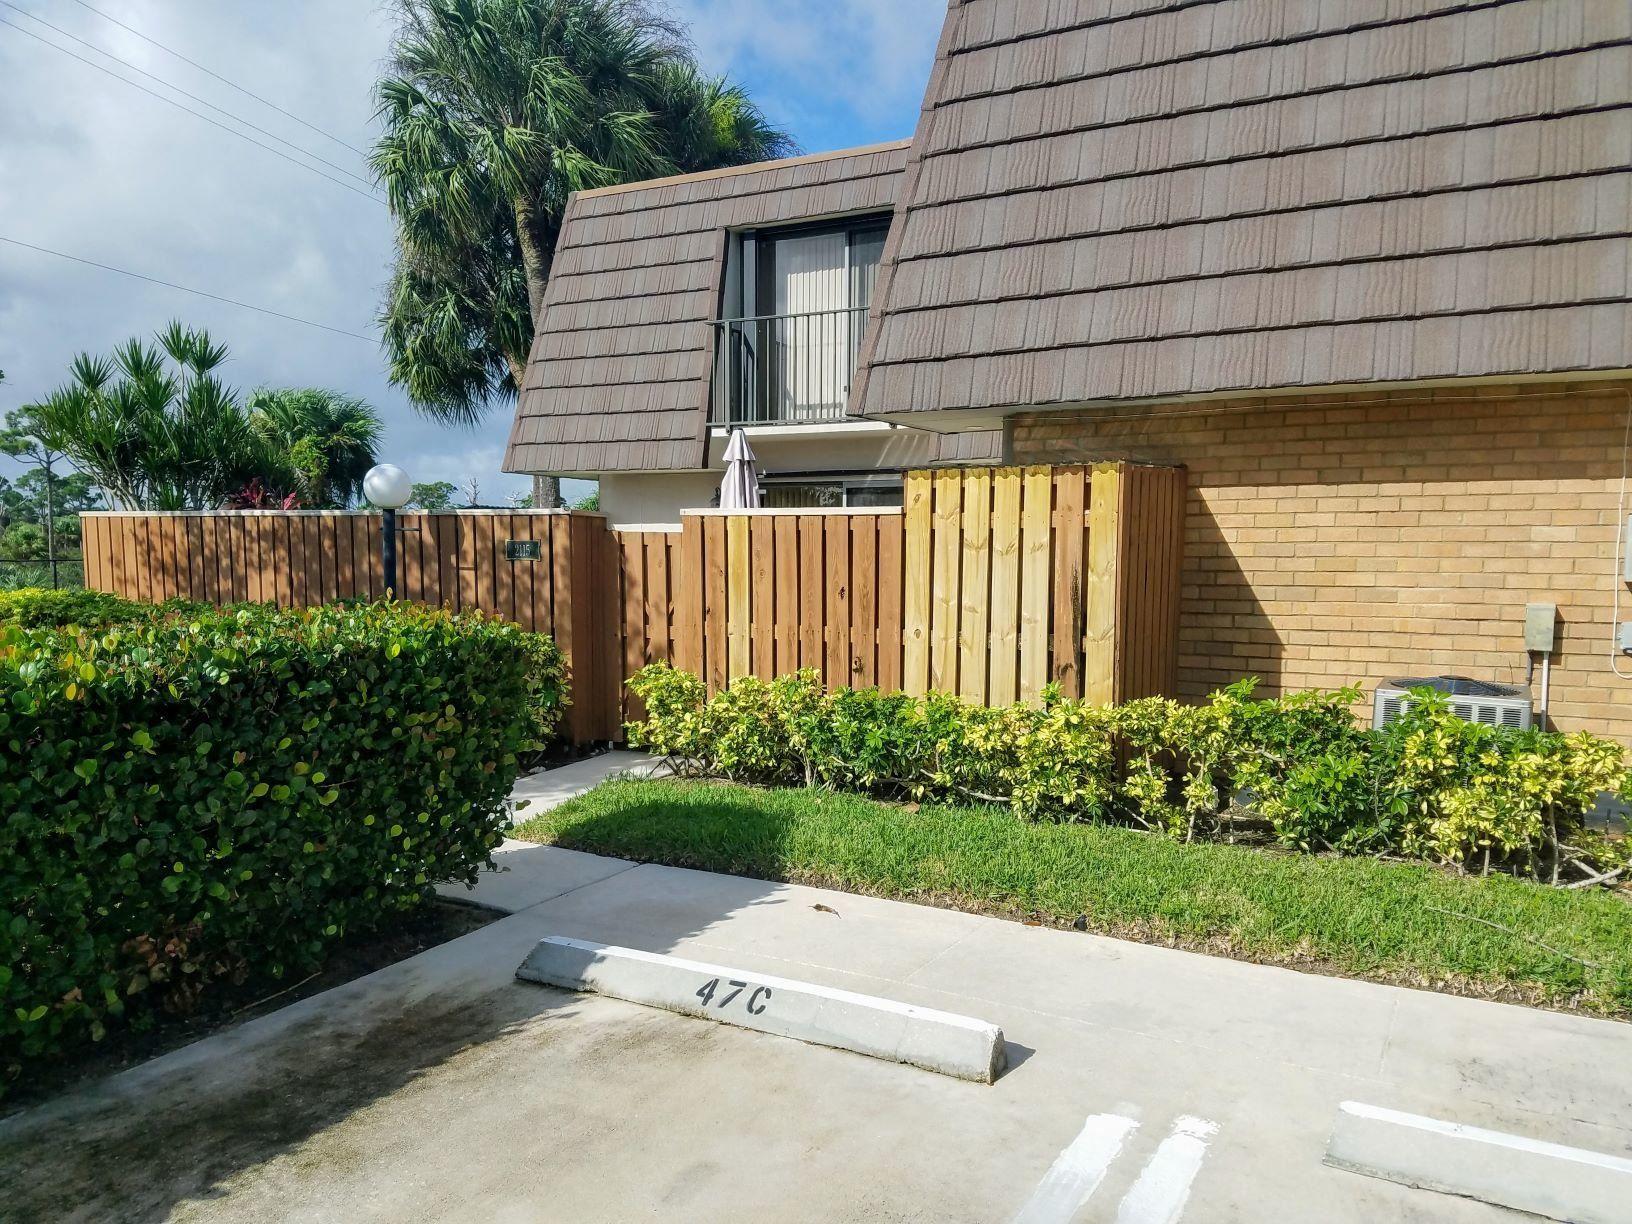 Photo of 2115 21st Court #47-C, Jupiter, FL 33477 (MLS # RX-10668295)